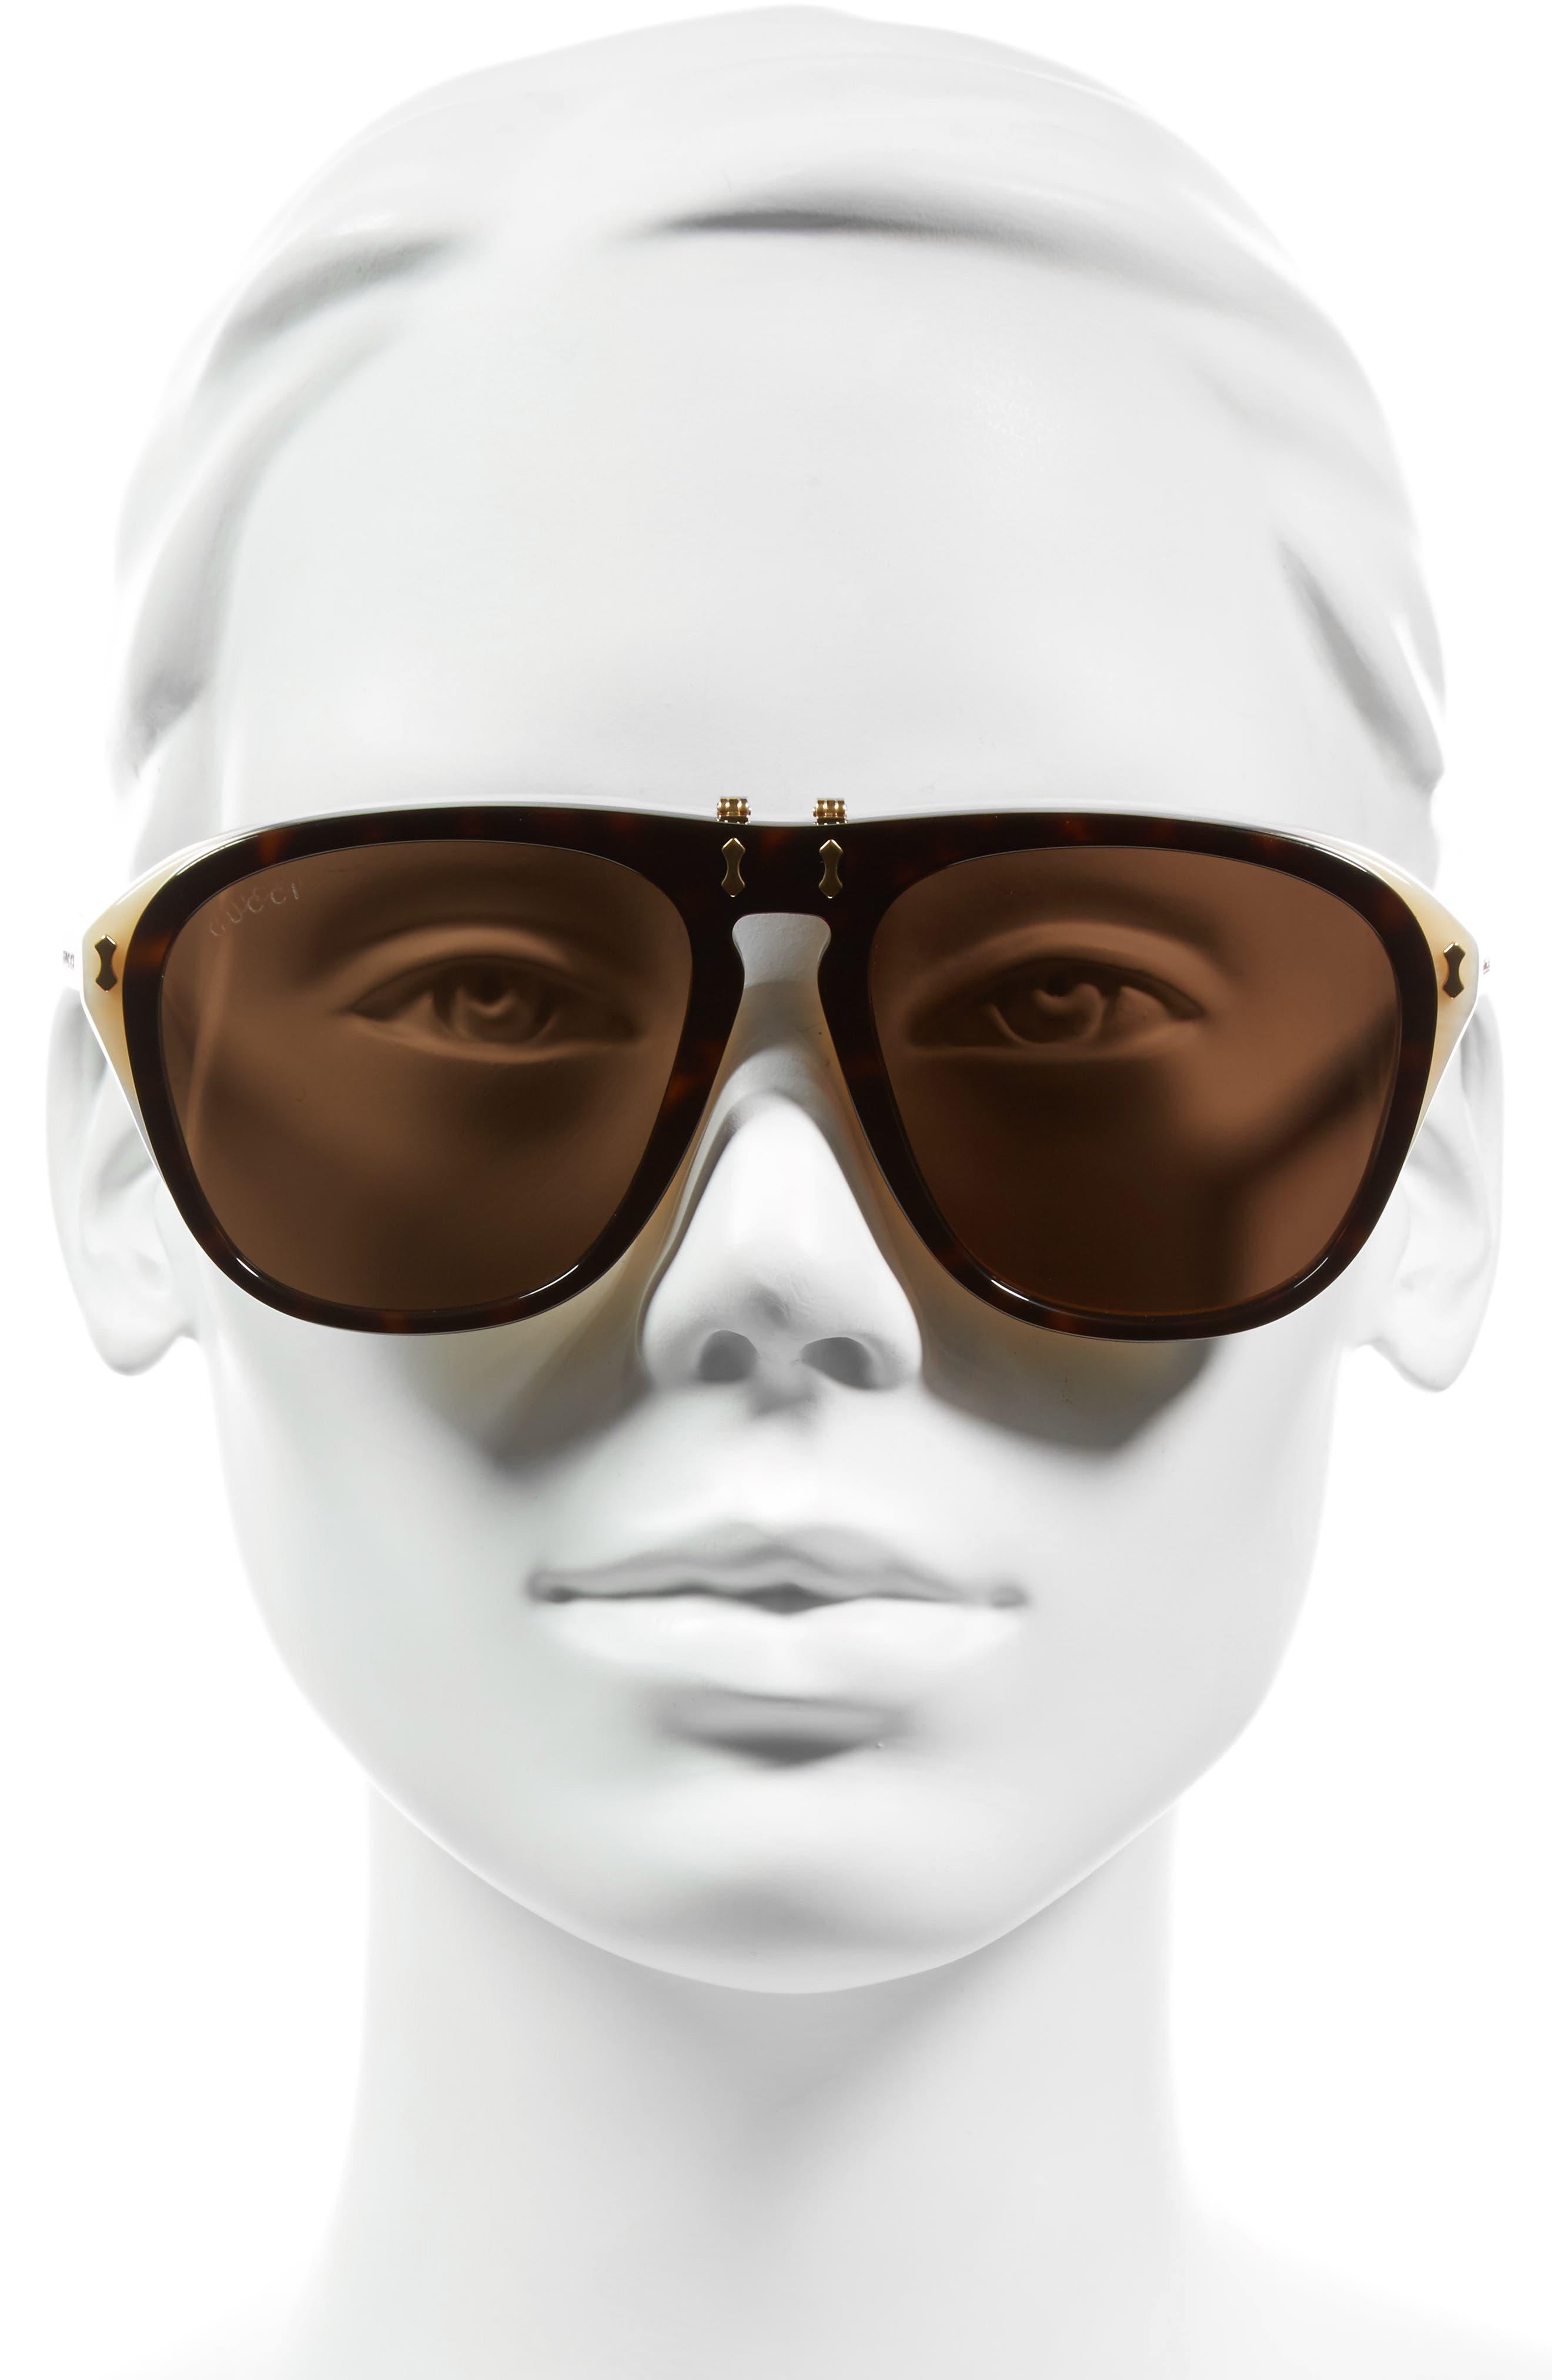 56mm Flip-Up Sunglasses,                             Alternate thumbnail 2, color,                             HAVANA/ BROWN